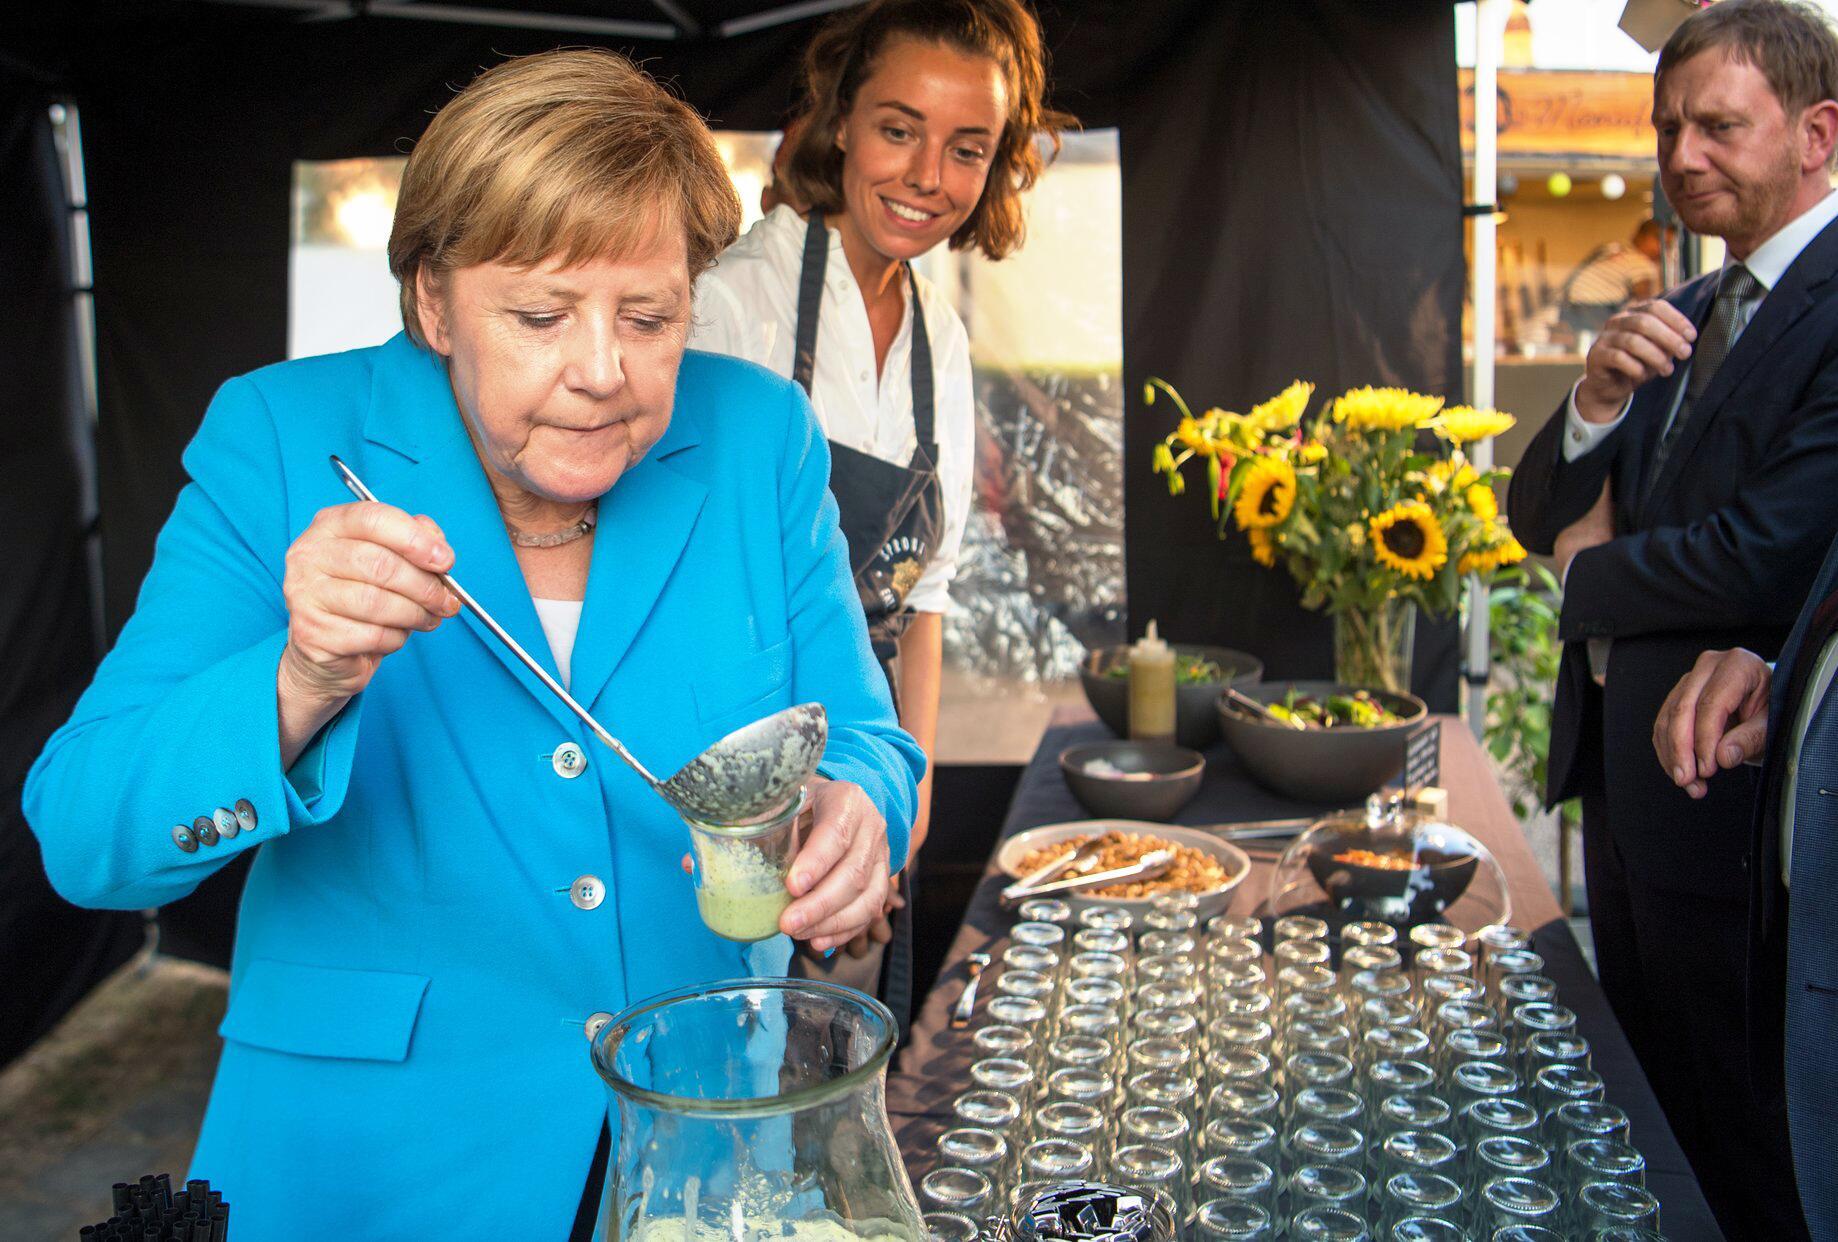 Bild zu Merkel attends Saxon CDU parliamentary group party in Dresden